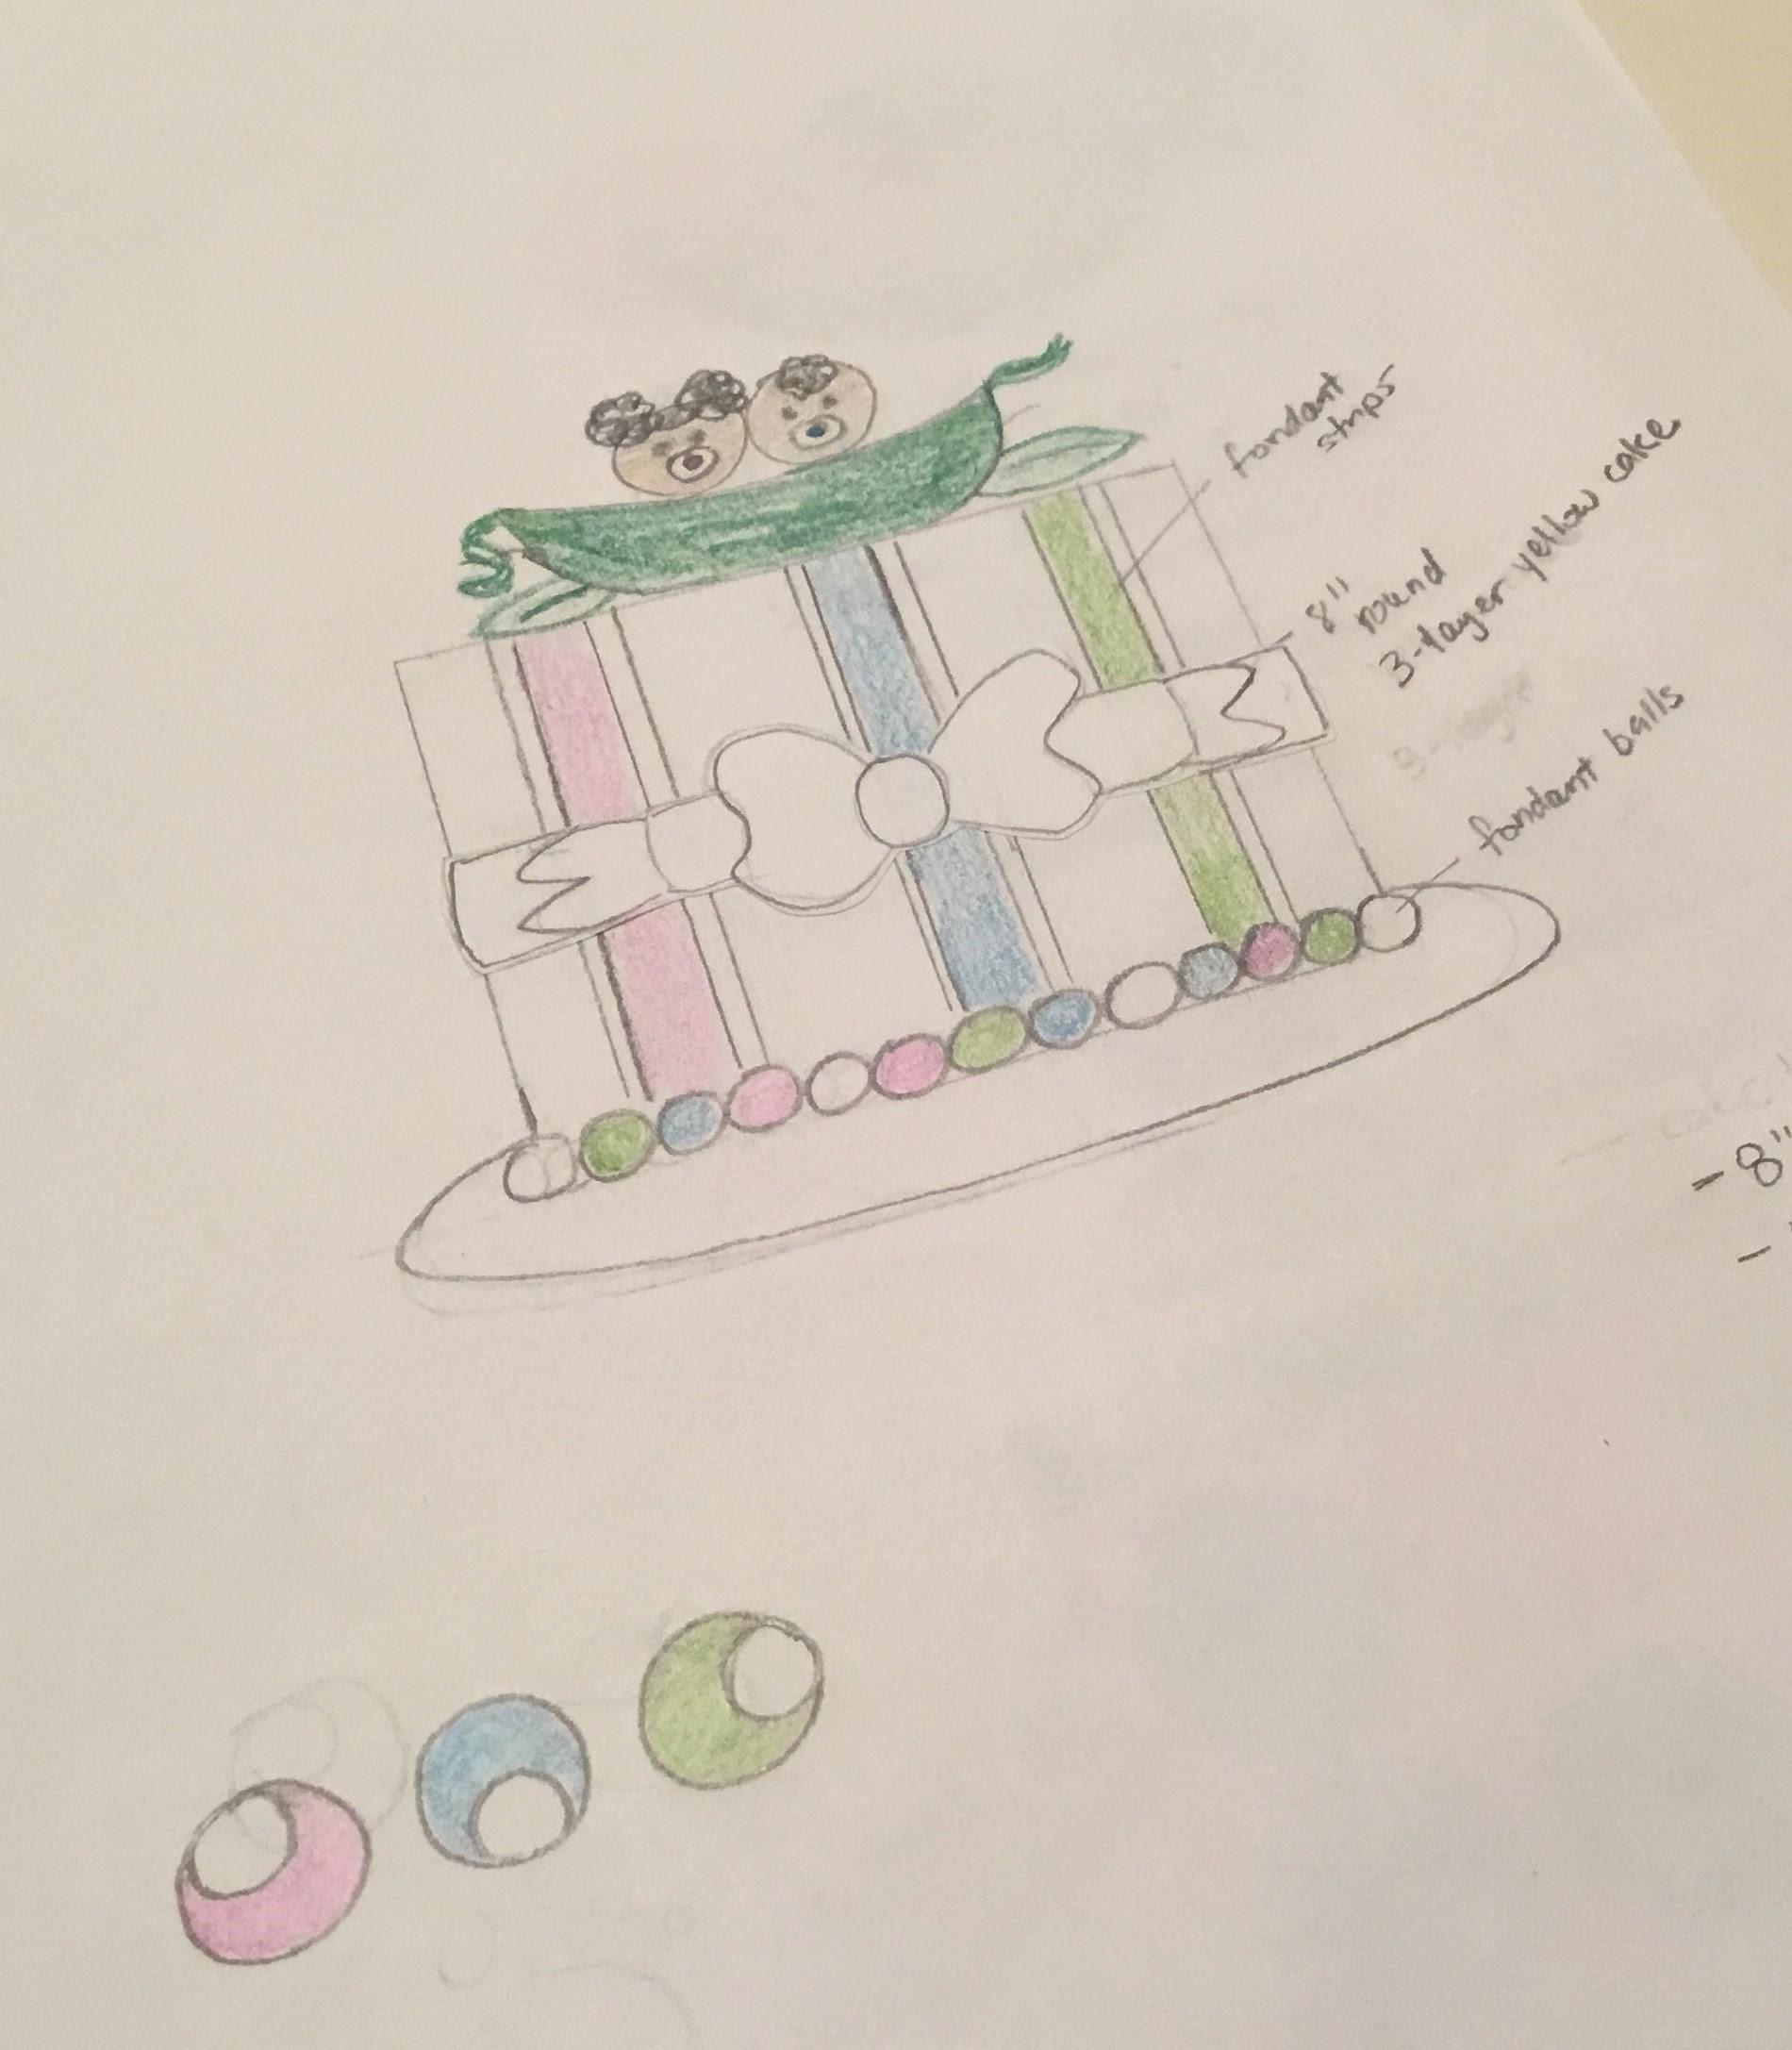 Peas in a Pod Sketch